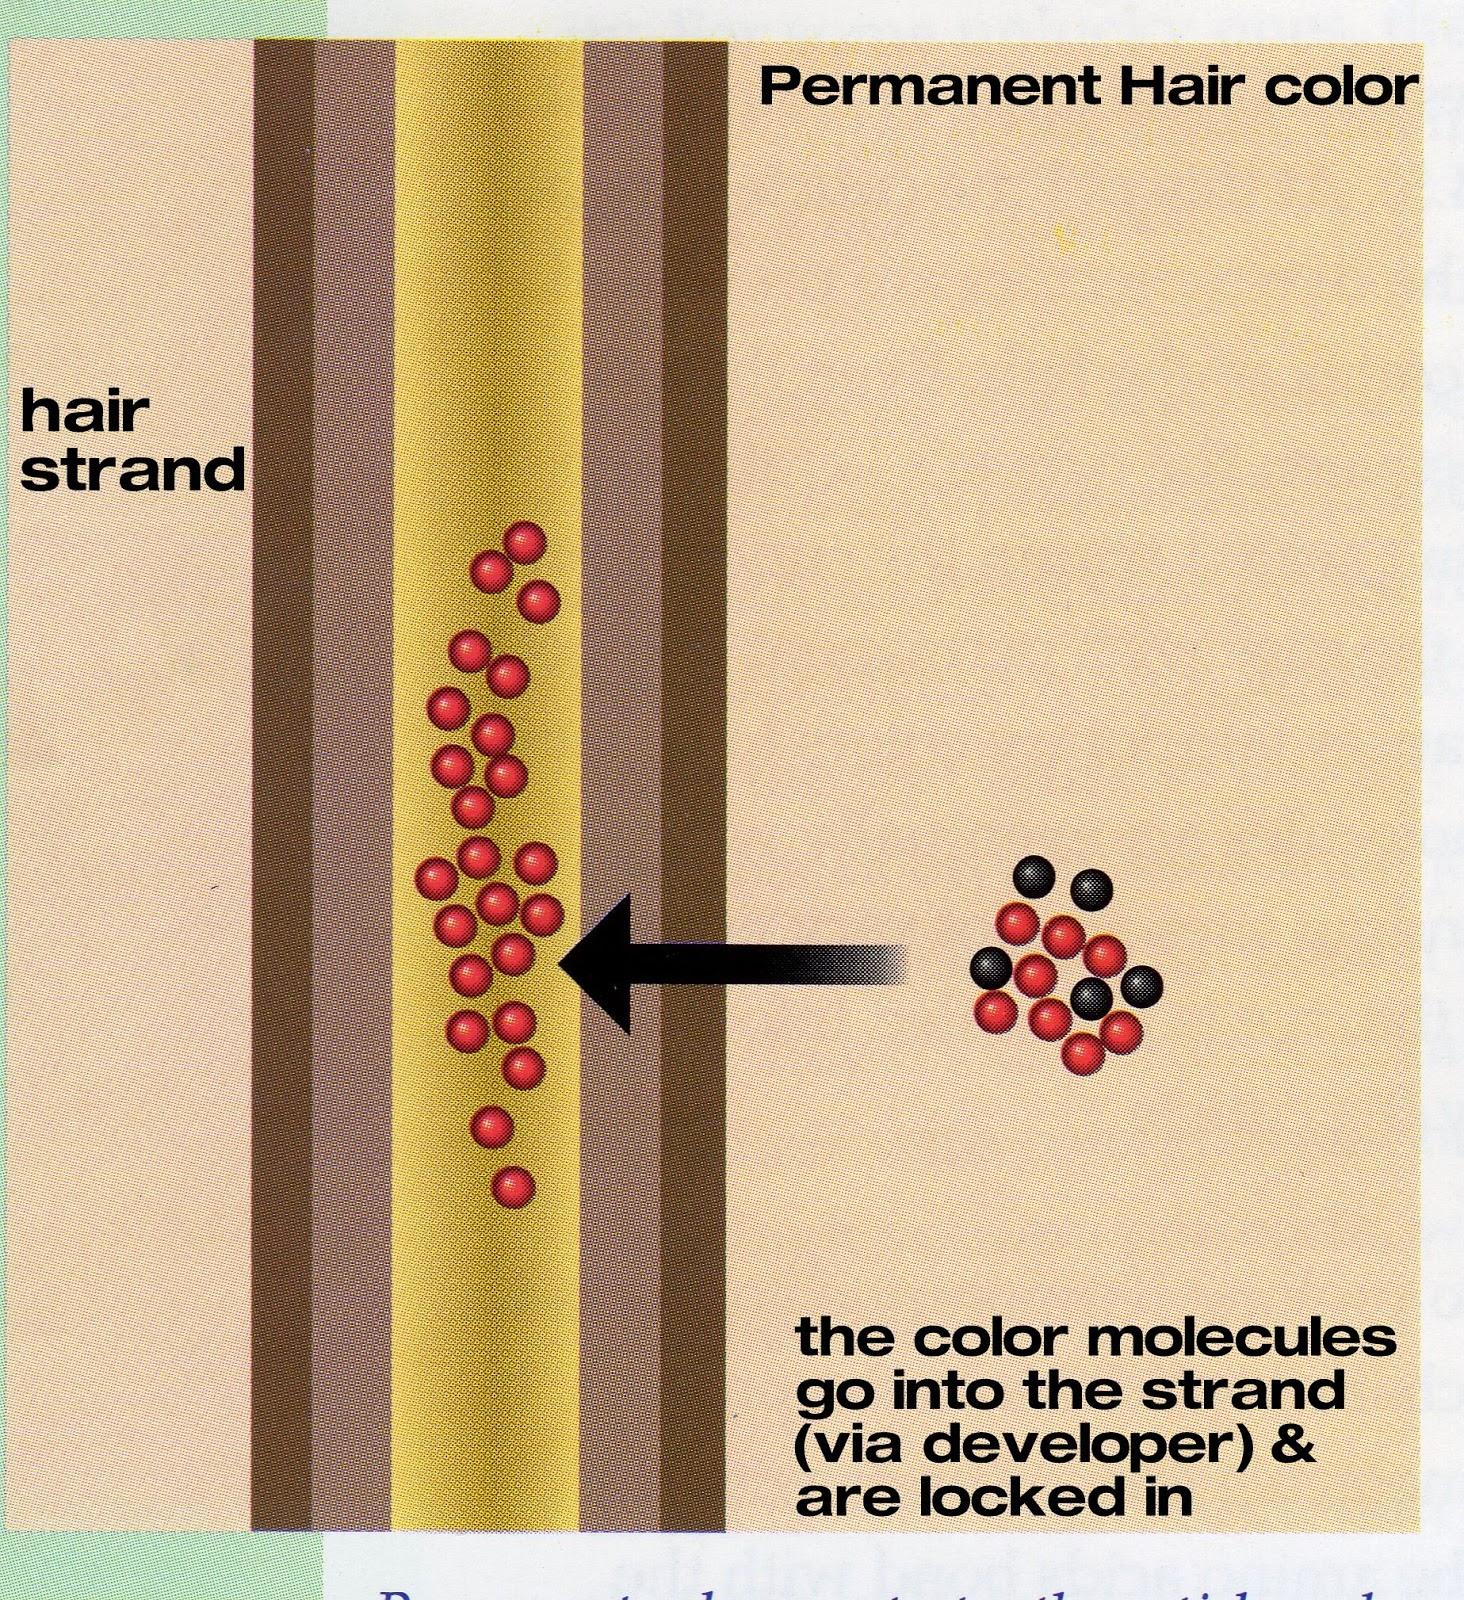 Penetrate the hair shaft #11